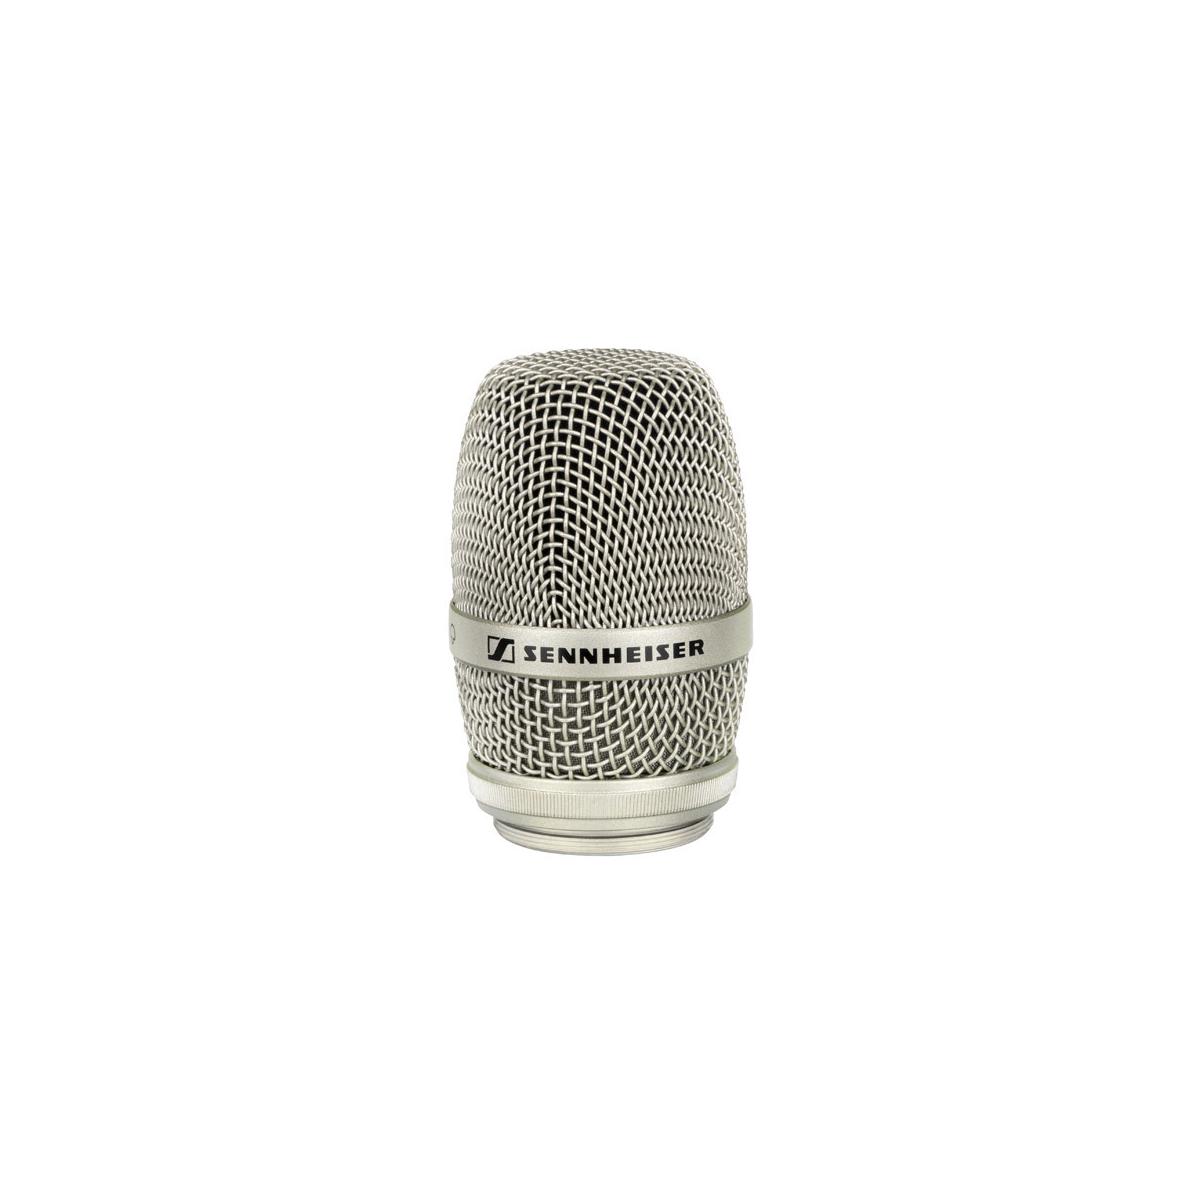 Micros chant sans fil - Sennheiser - MMK 965-1 NI capsule E965